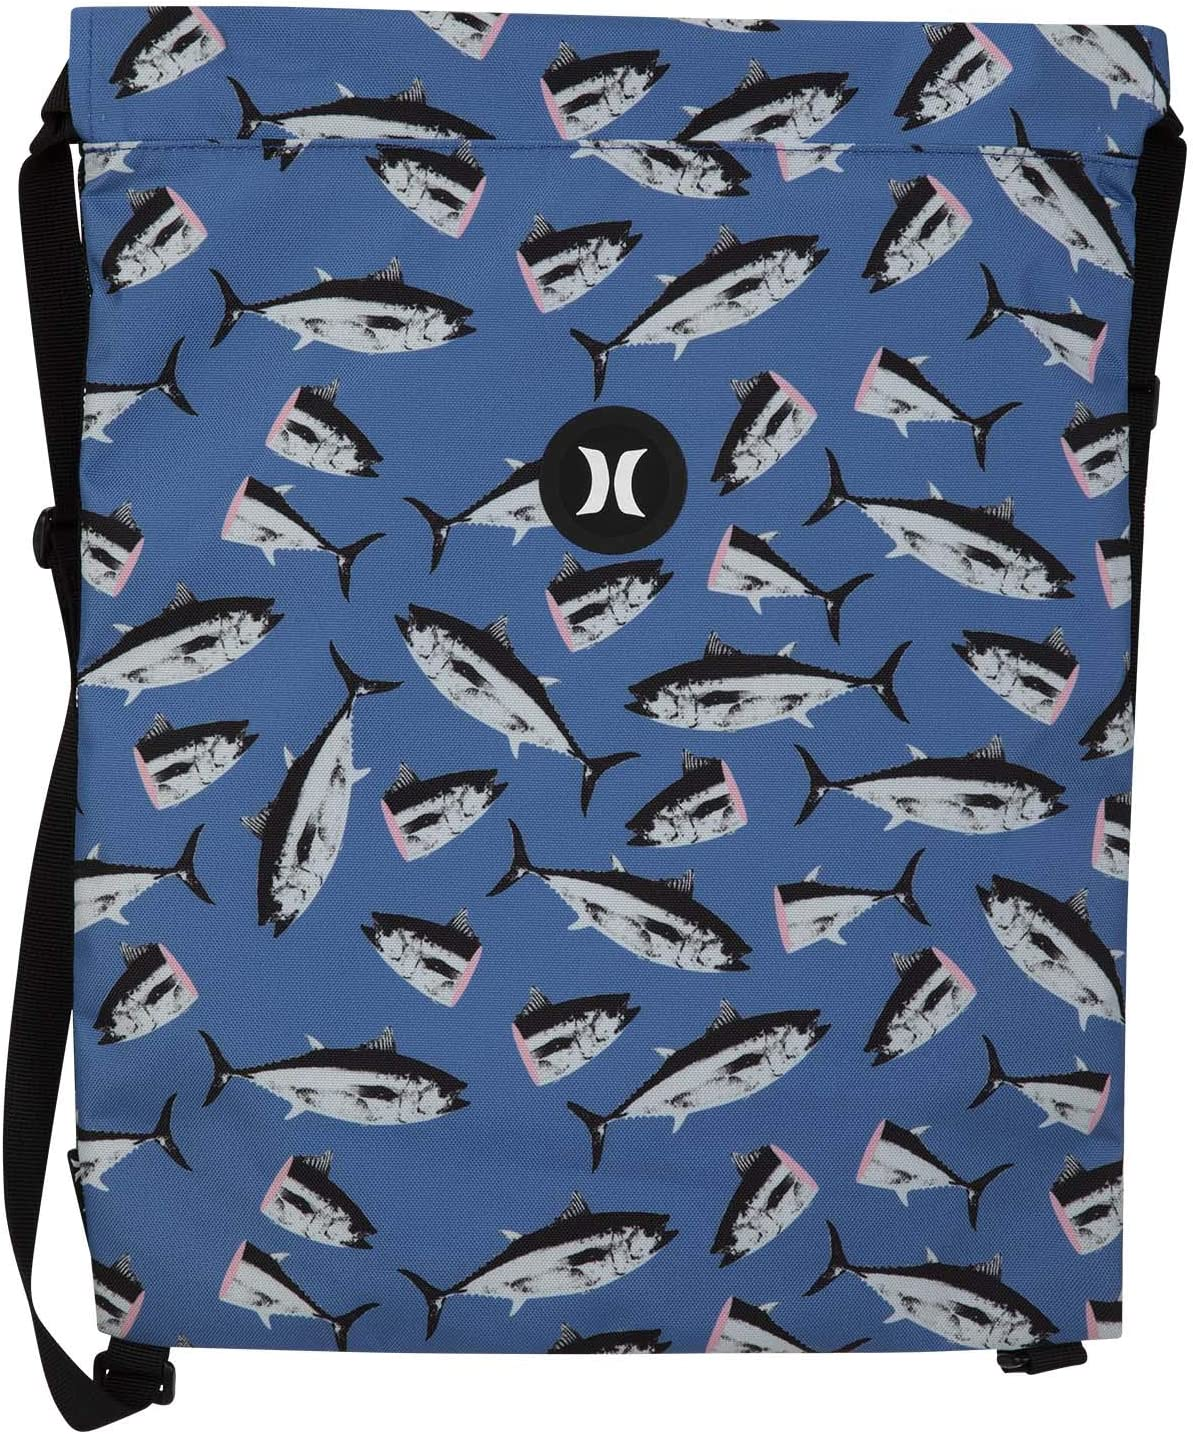 Hurley U Beach Cinch Printed Bolsa Hombre Pacific Blue 1SIZE